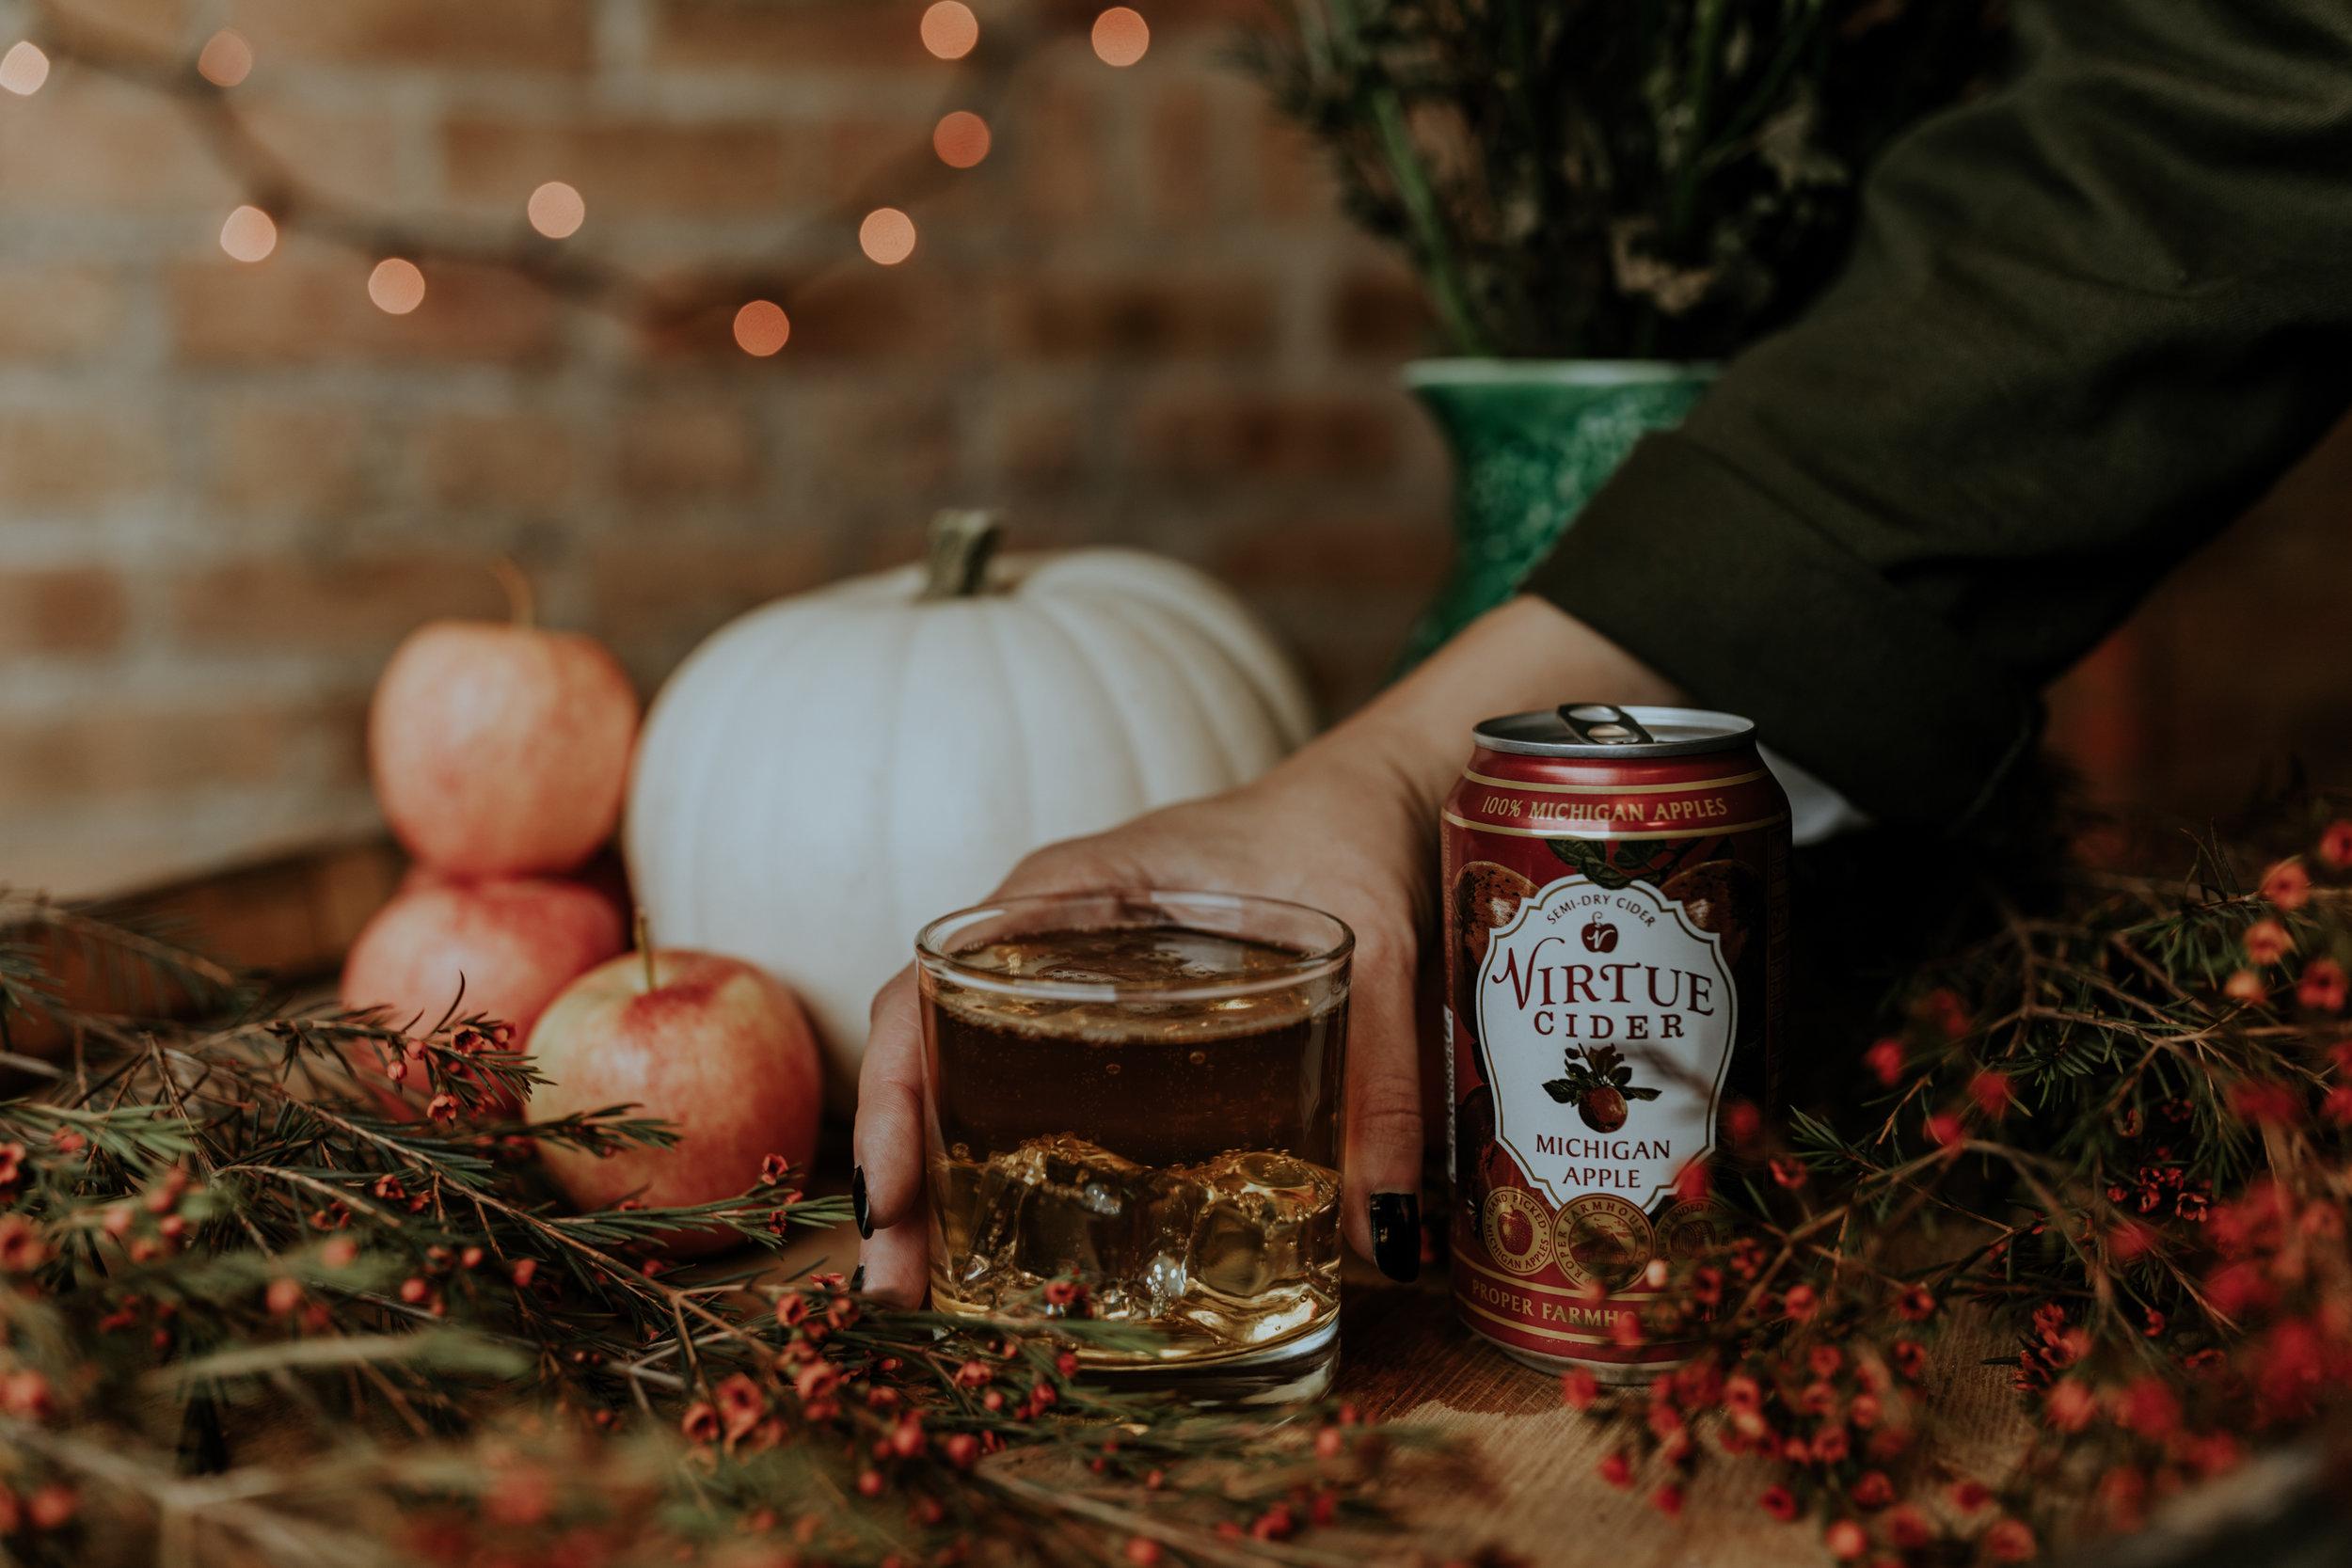 halloween cocktails blog galleries-21.jpg